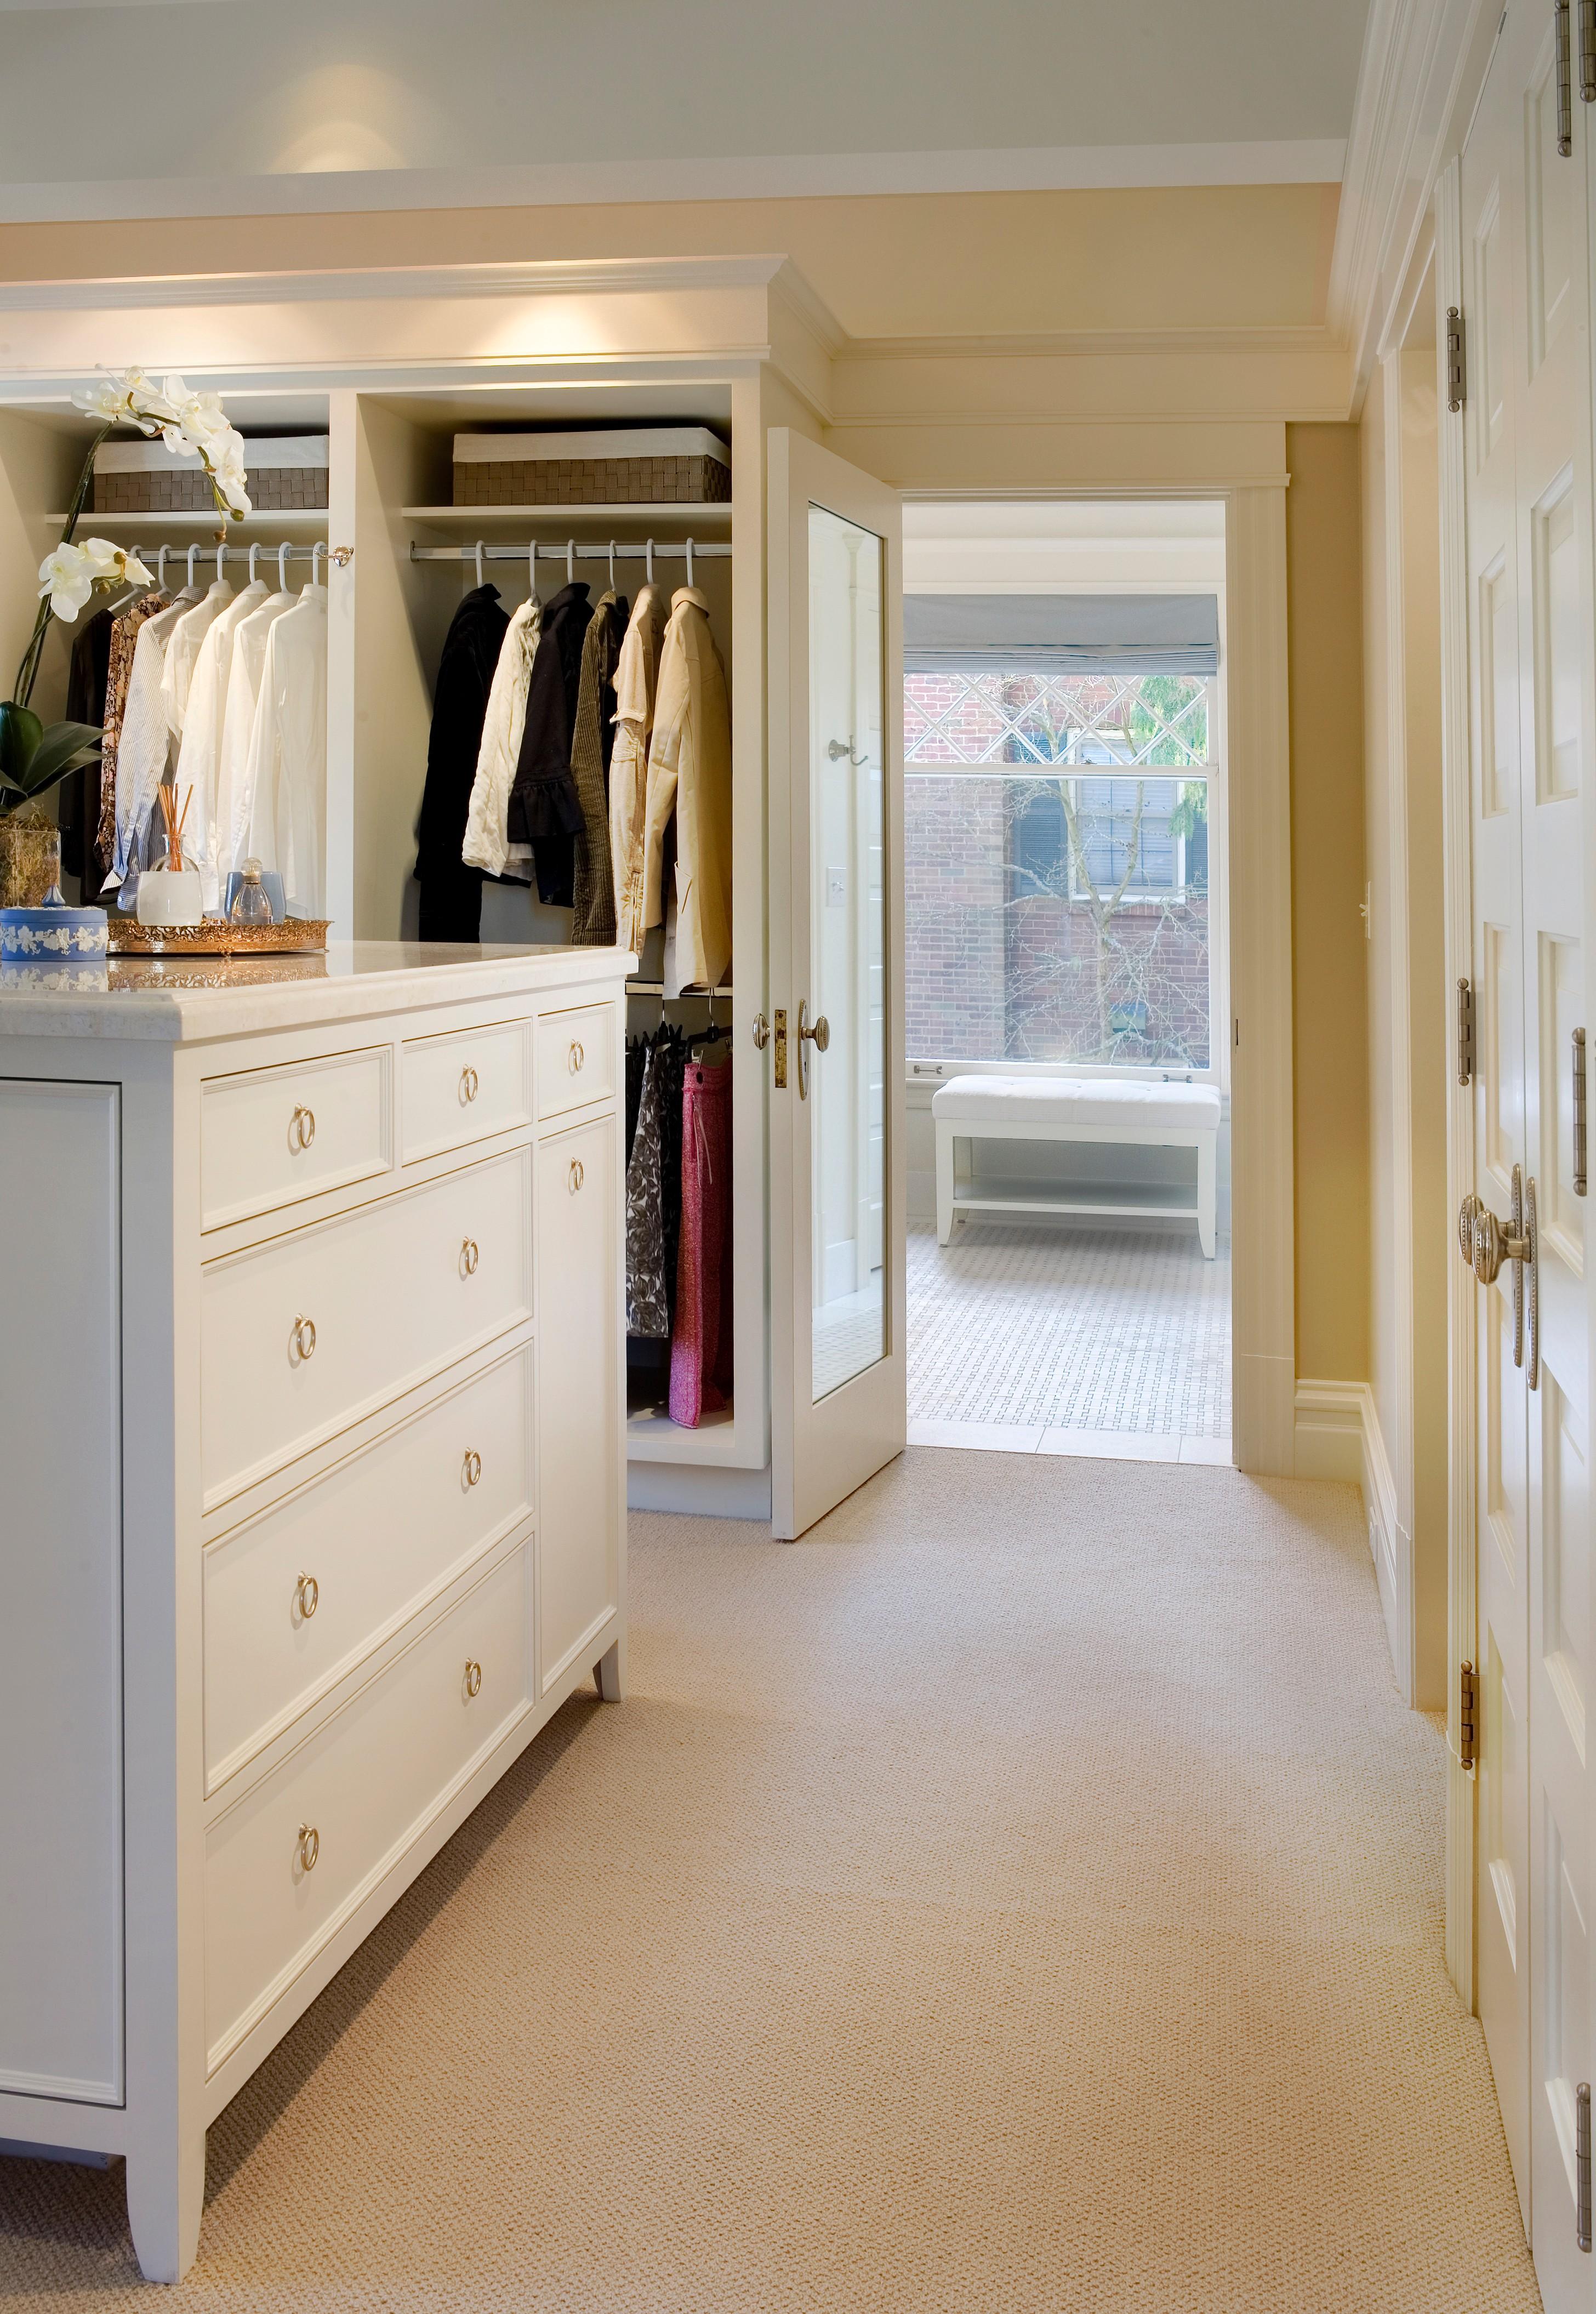 Colleen Knowles Interior Design - organize